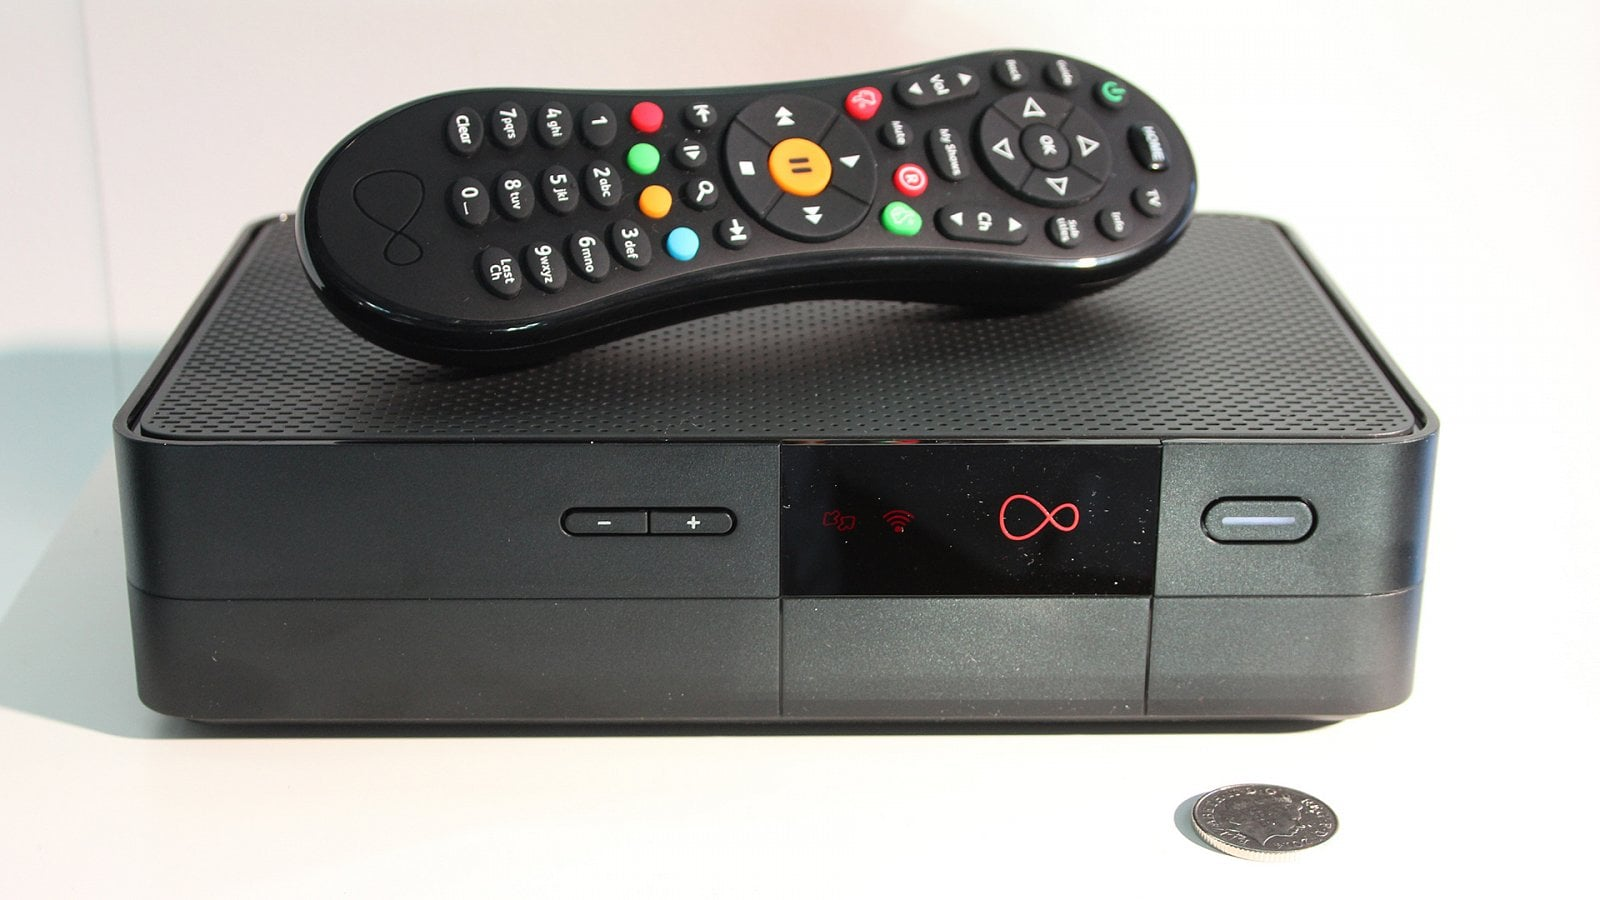 Virgin TV box